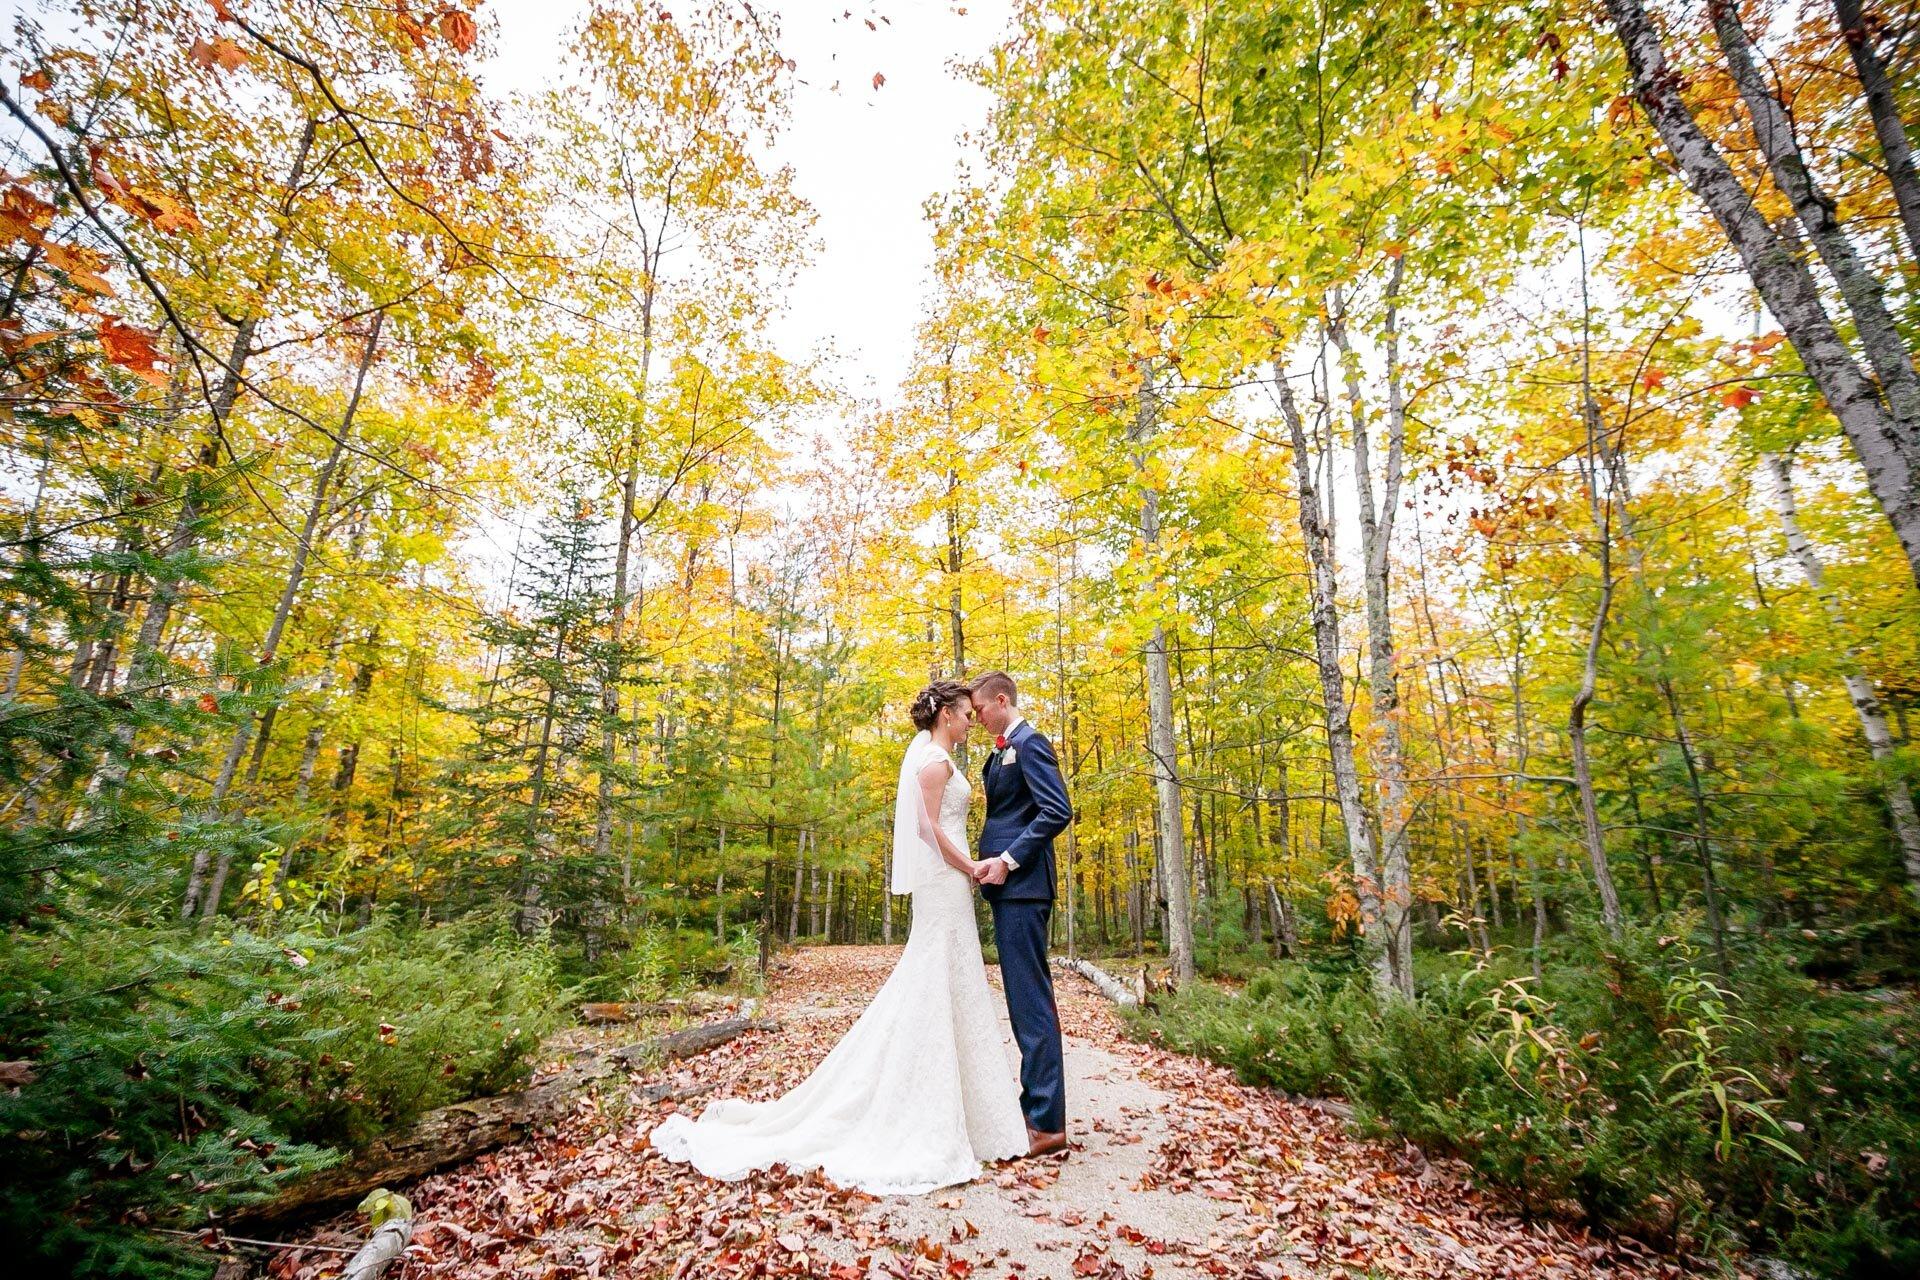 fall-lighting-adam-shea-photography-wedding-engagement-blog-adam-shea-photography-green-bay-appleton-neenah-photographer-09.jpg